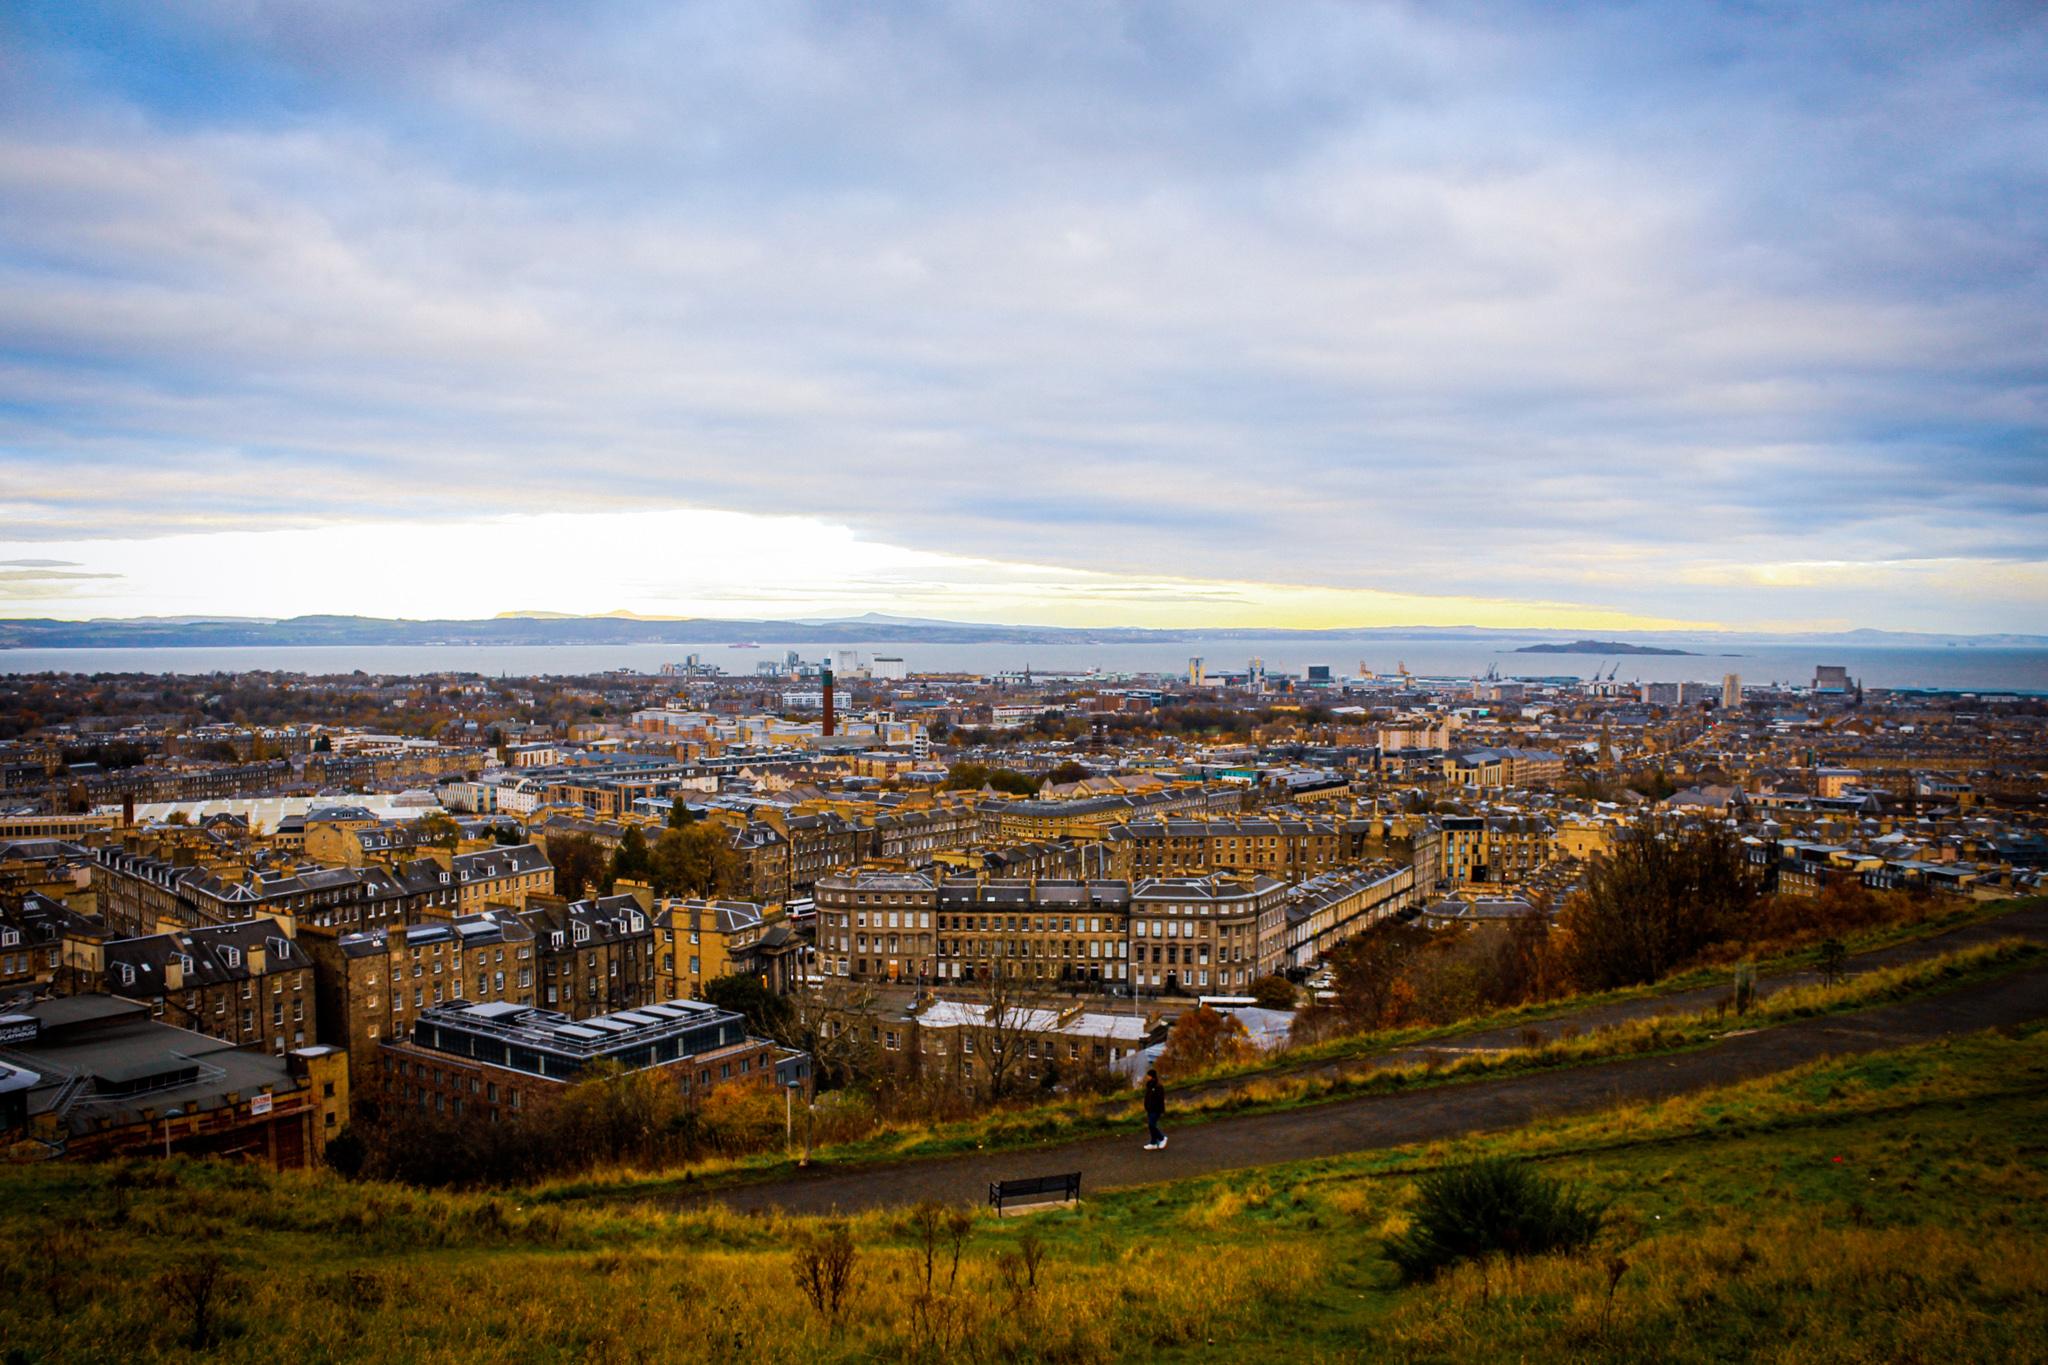 Edimbourg pendant 3 jours